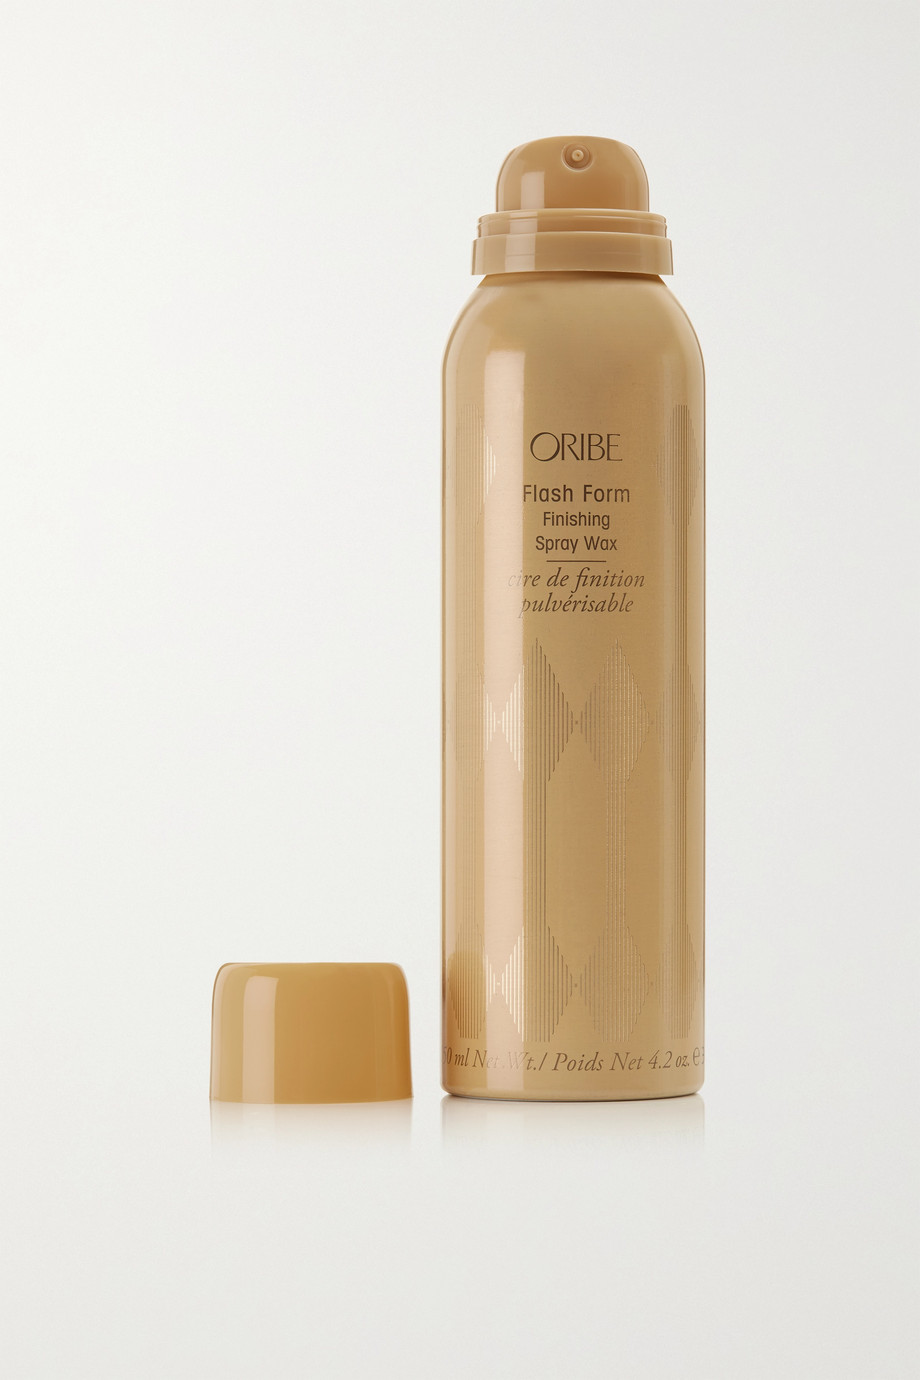 Oribe Flash Form Finishing Spray Wax, 150ml